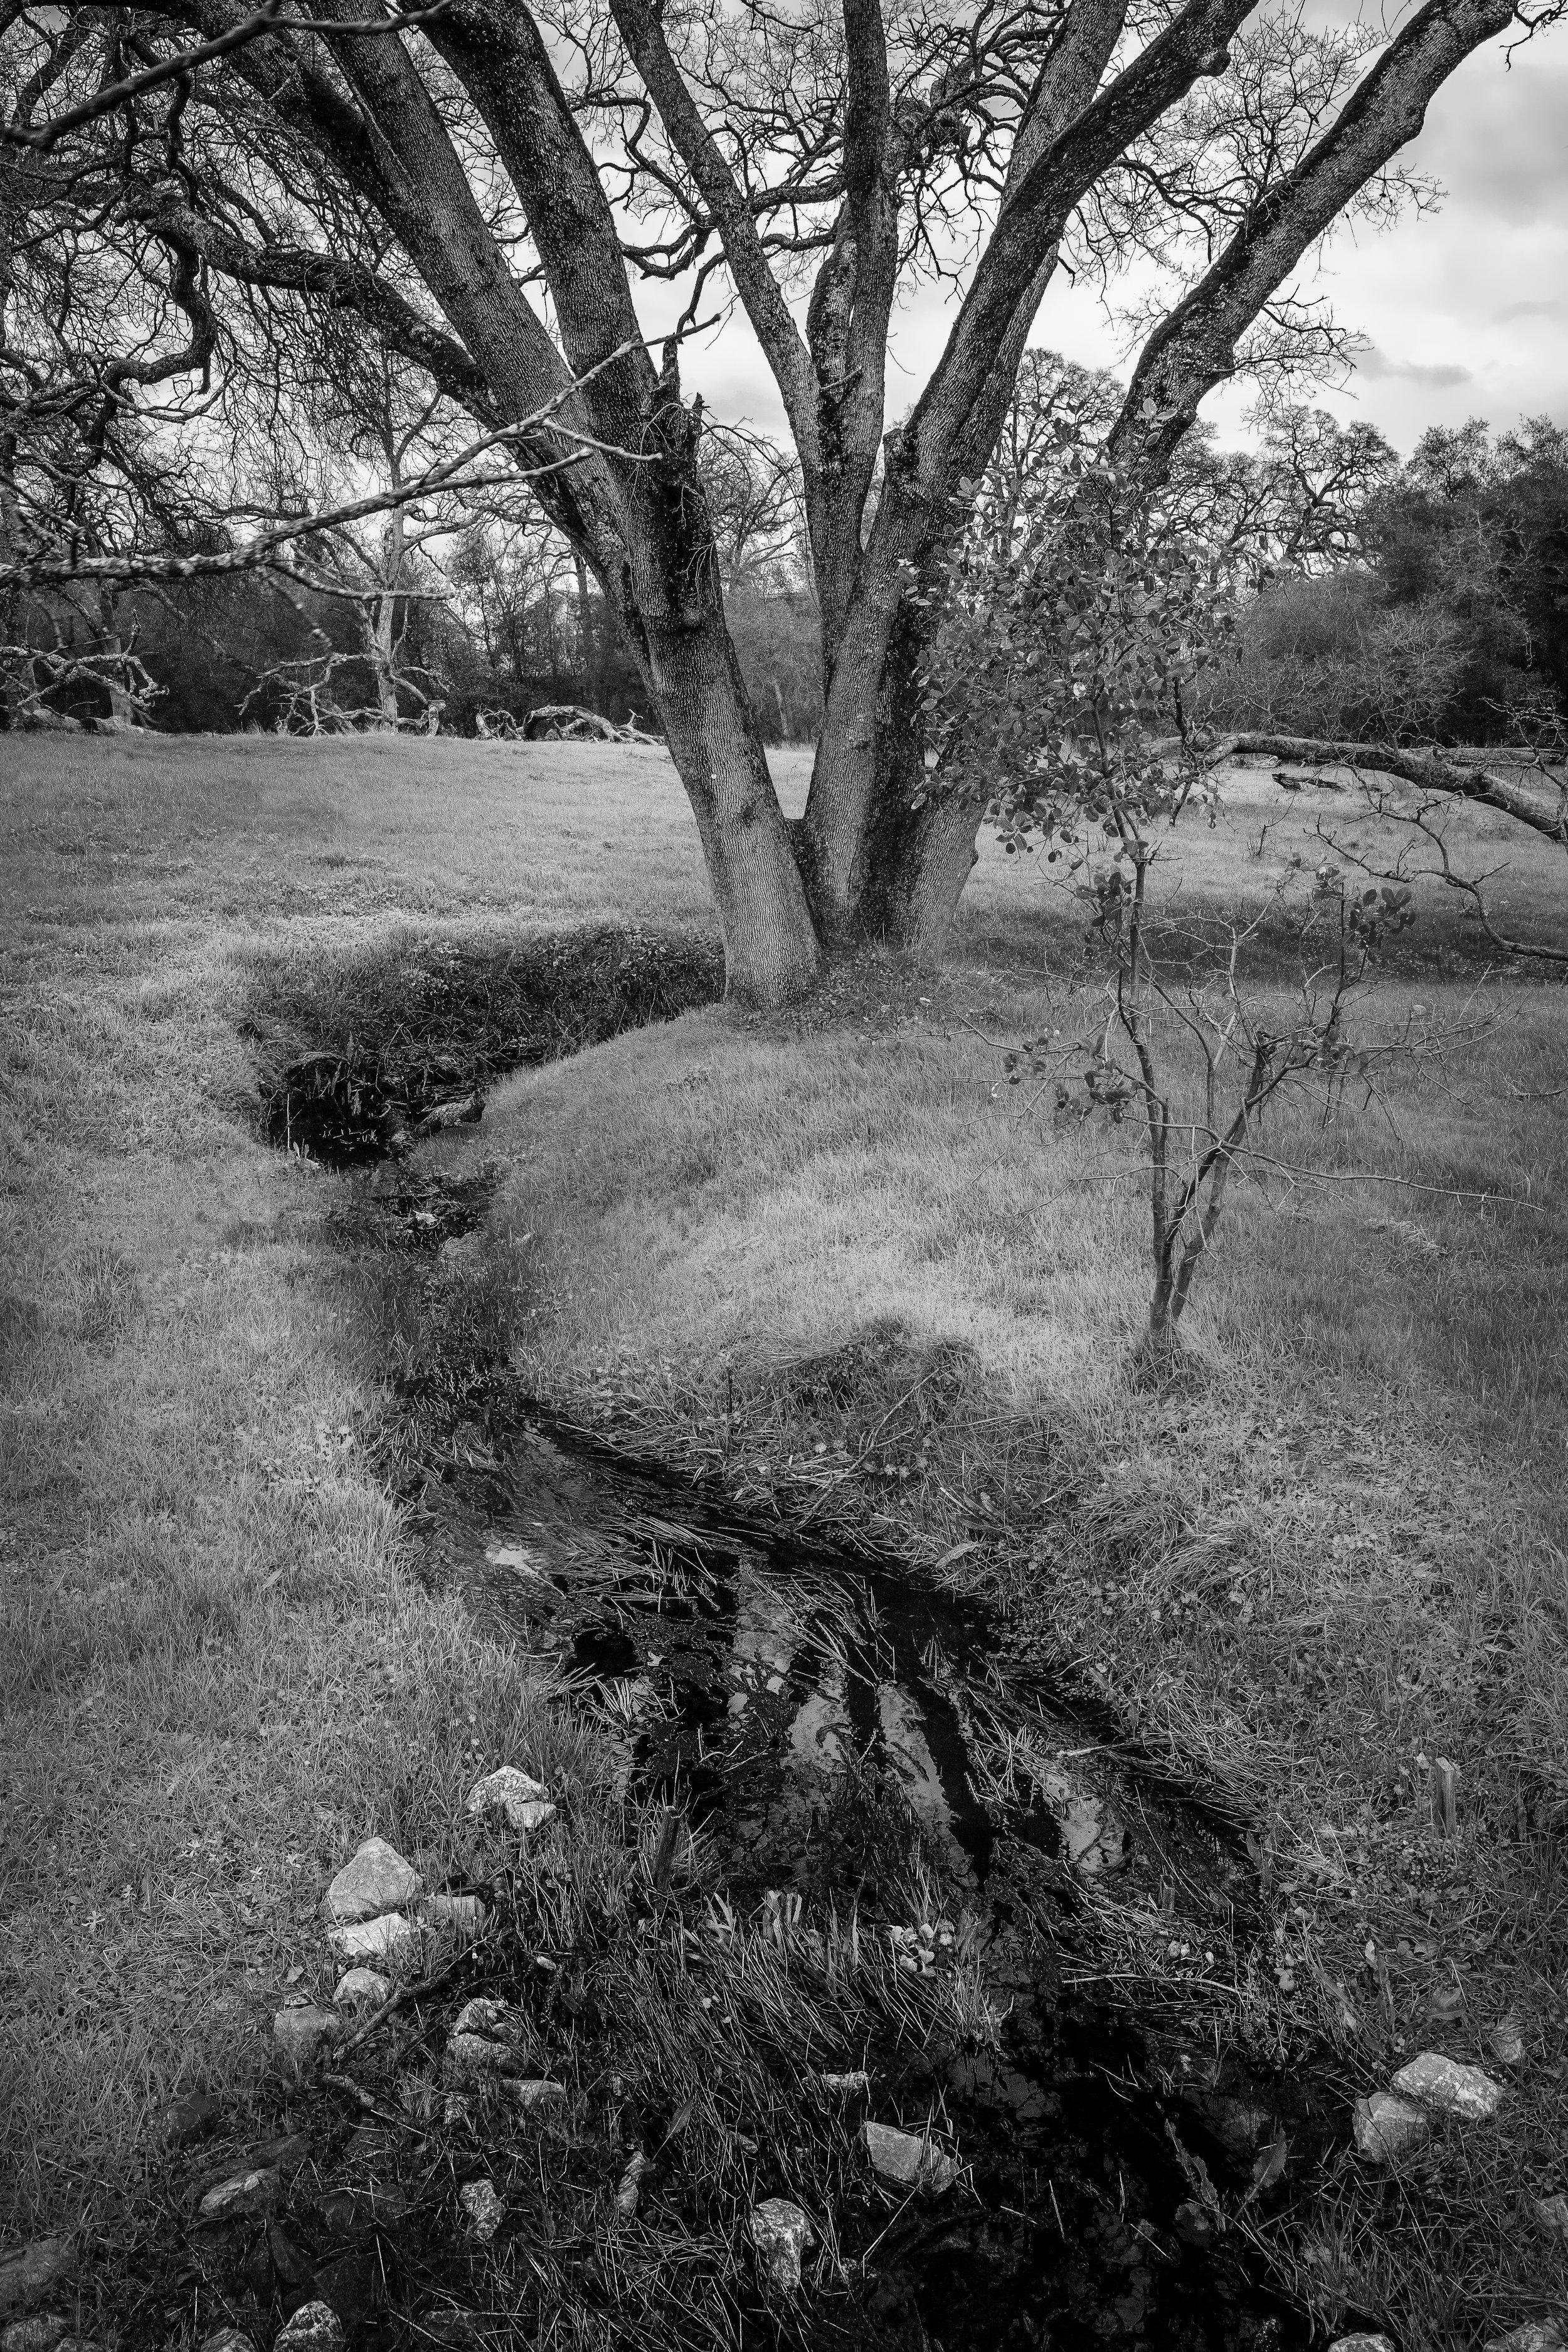 Triburaty to Branch Creek